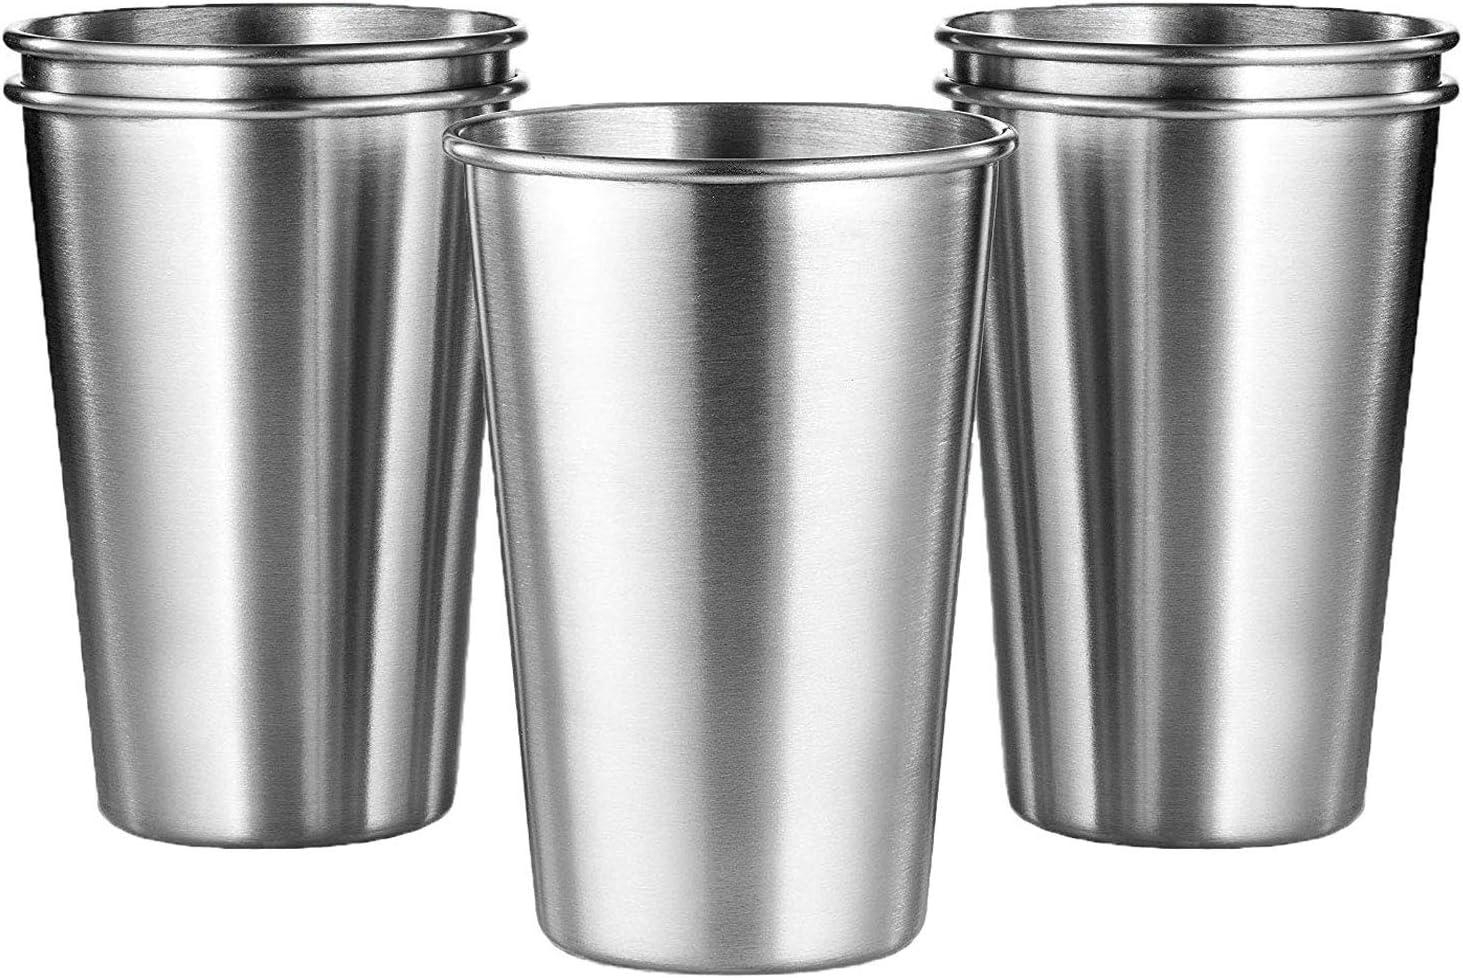 KISEER 5 Pack 16 Ounce Stainless Steel Pint Cups Shatterproof Cup Tumblers Unbreakable Metal Beer Drinking Glasses for Bar, Home, Restaurant